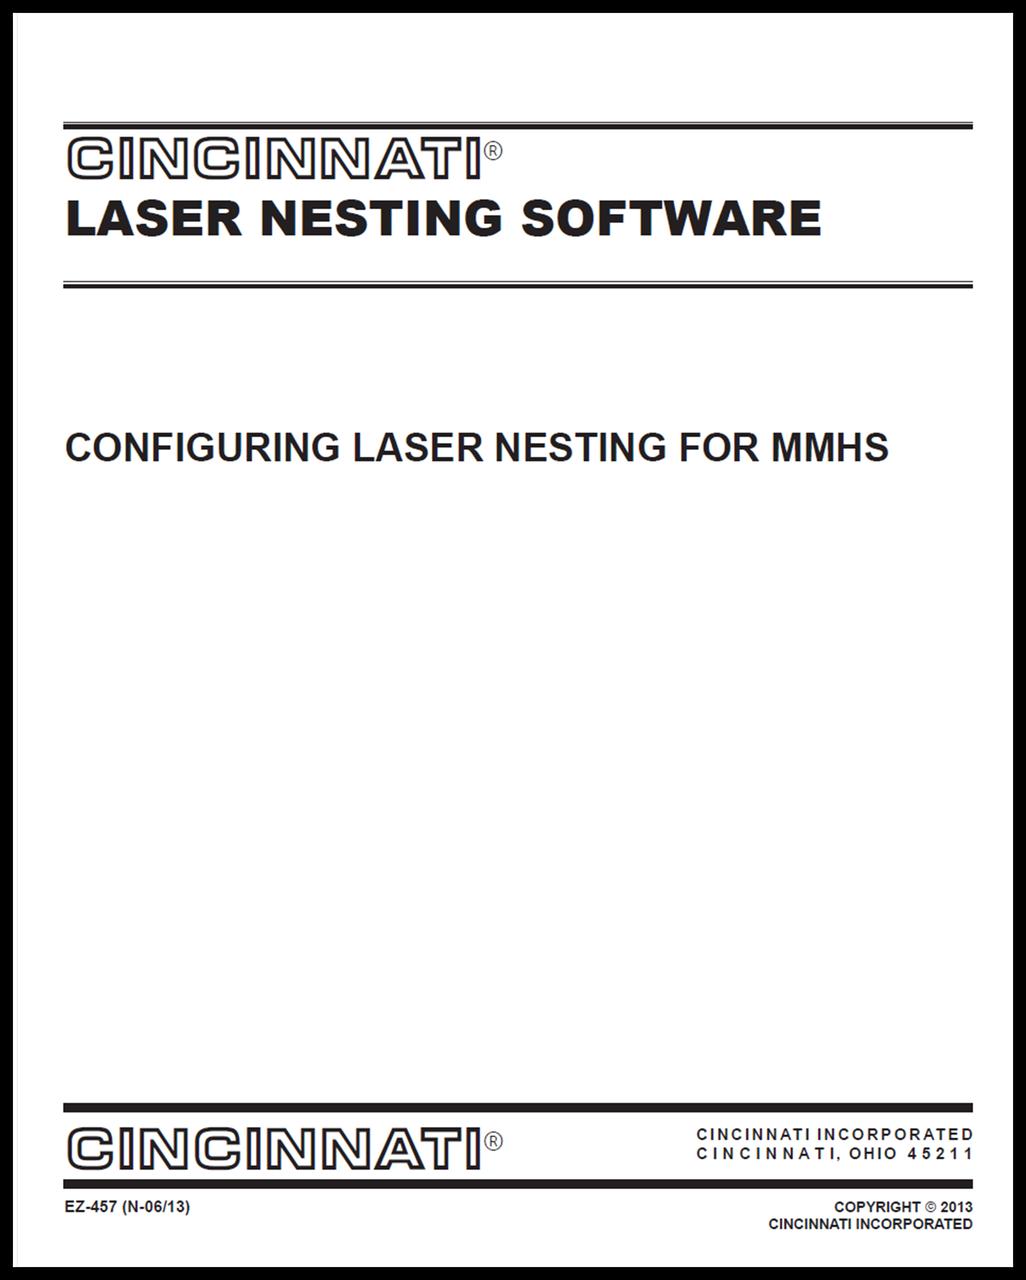 EZ-457 (N 0513) Configuring Laser Nesting for MMHS